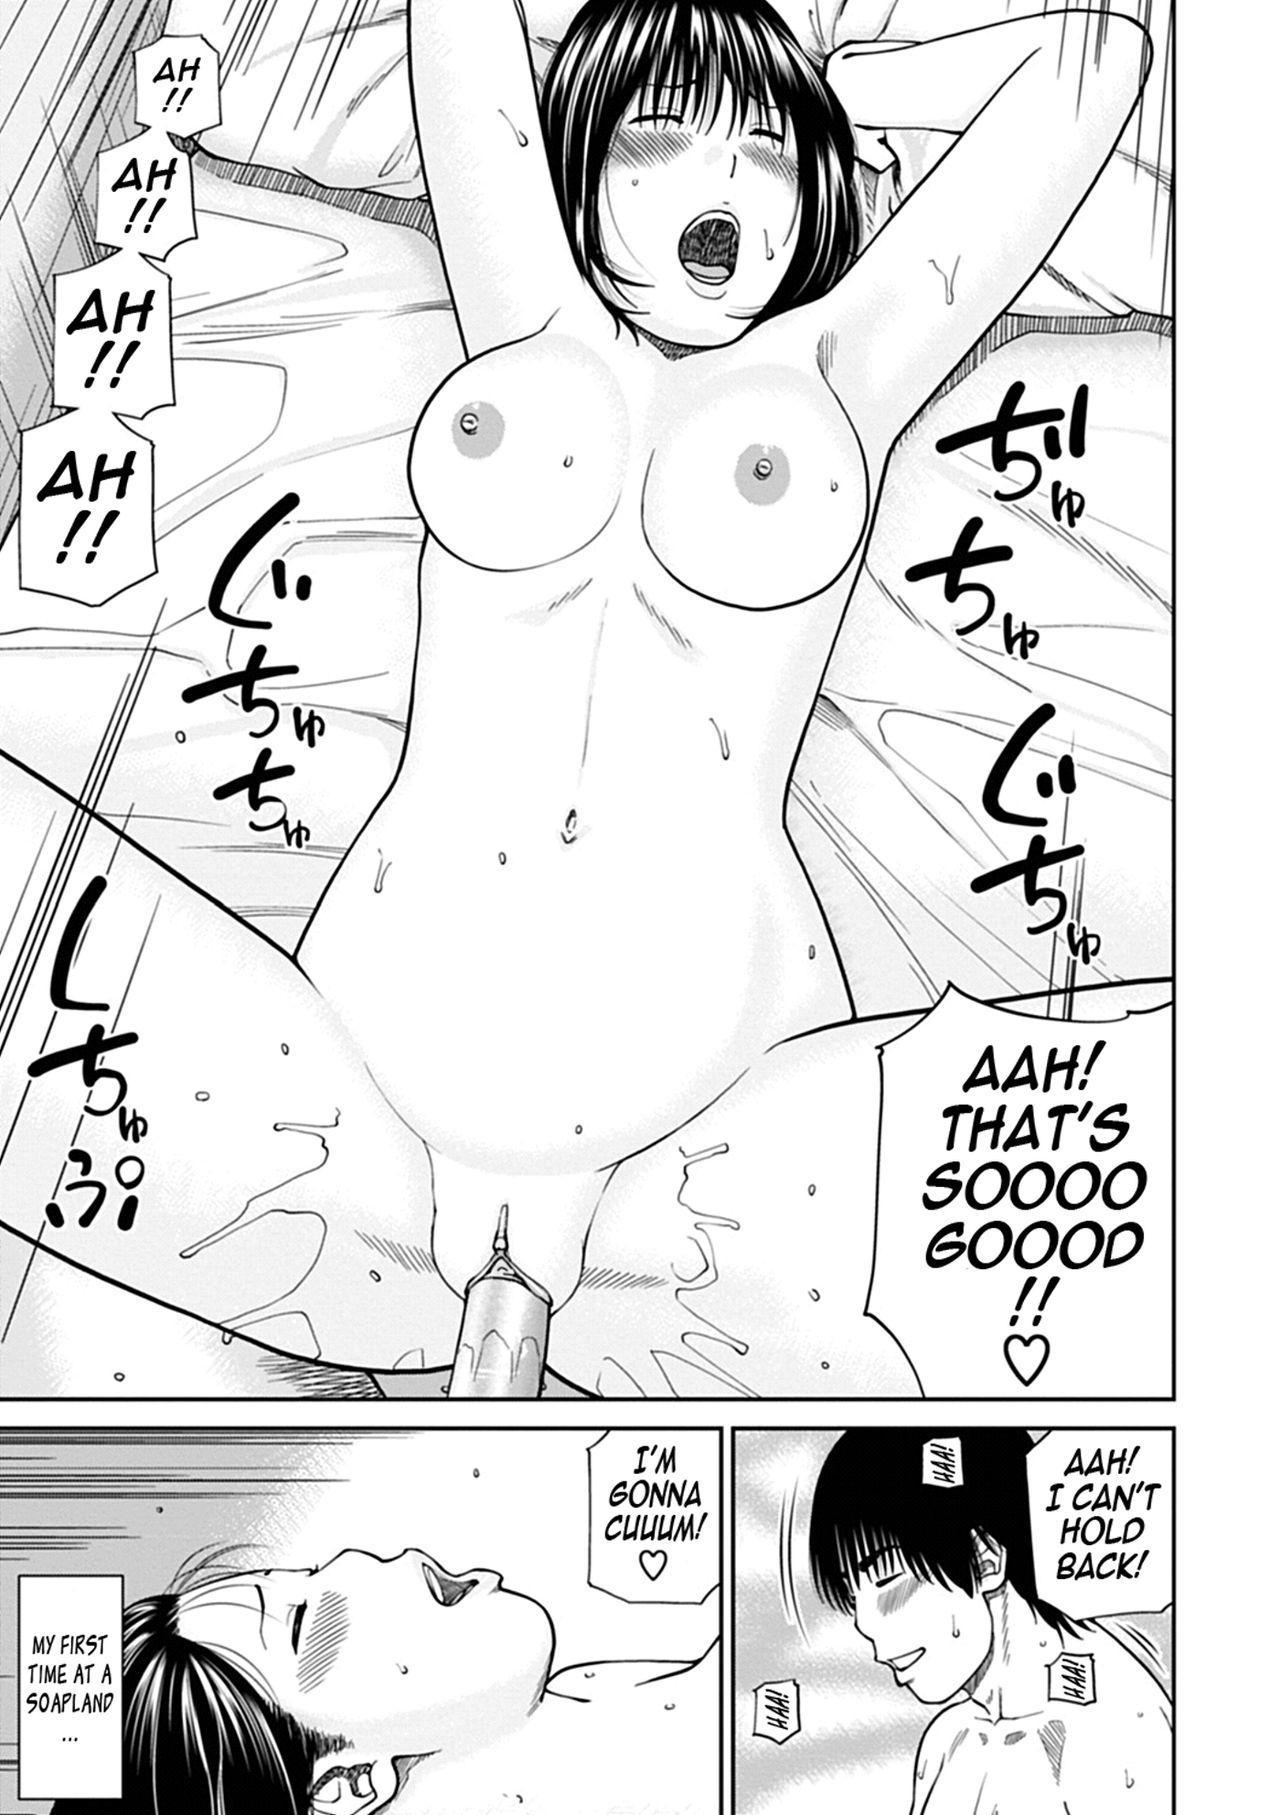 [Kuroki Hidehiko] 36-sai Injuku Sakarizuma | 36-Year-Old Randy Mature Wife [English] {Tadanohito} [Digital] [Uncensored] 30